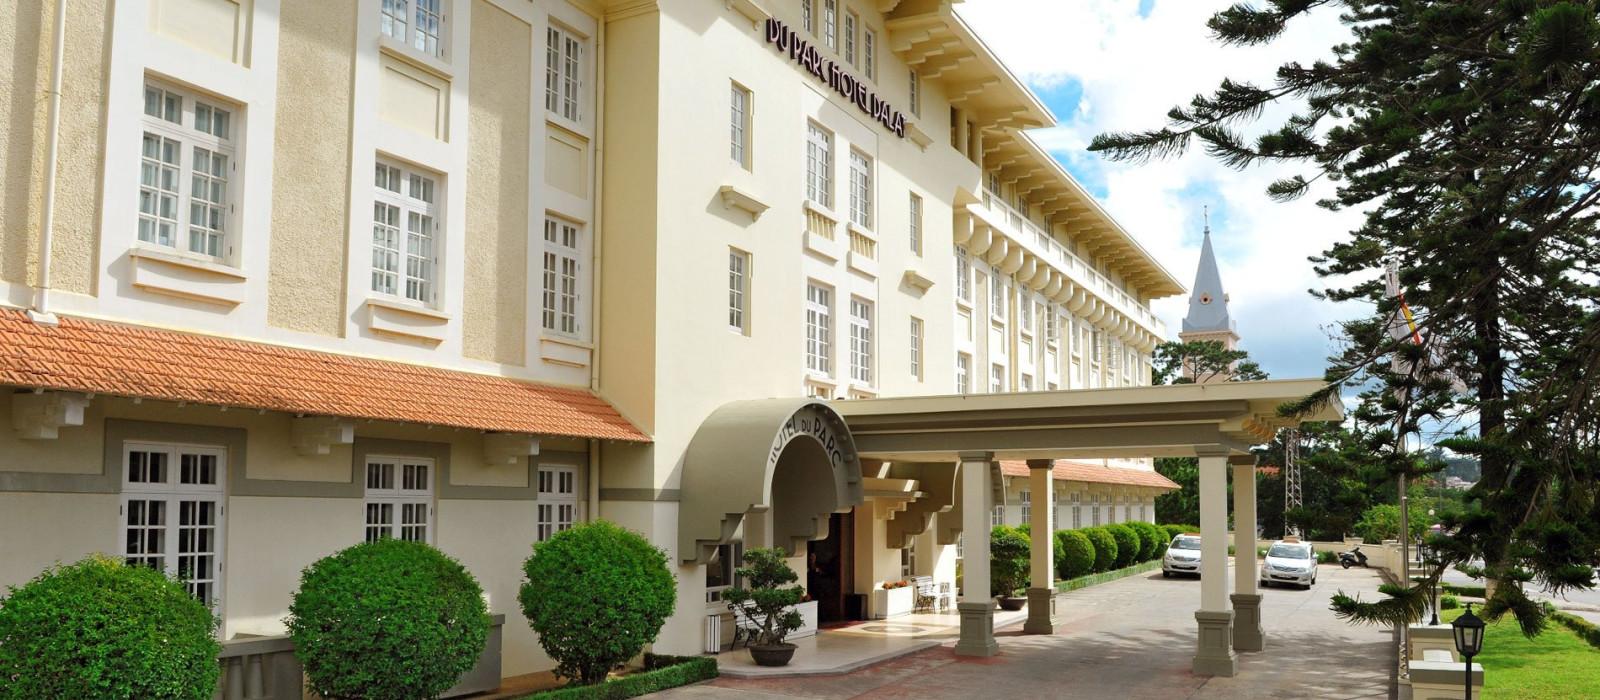 Hotel Dalat du Parc Vietnam